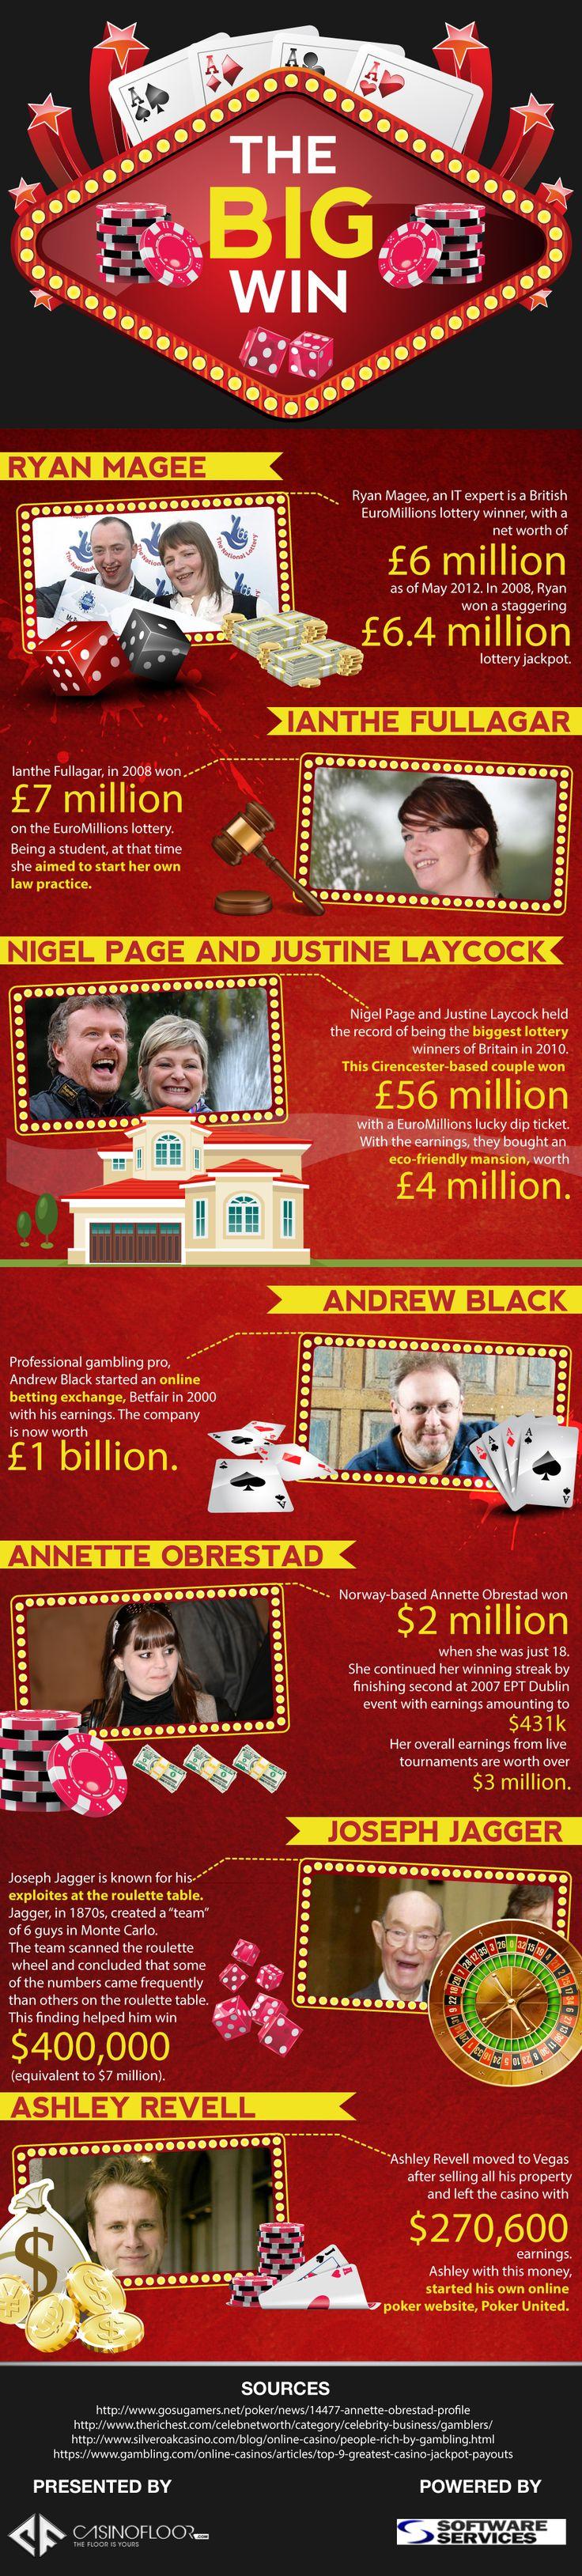 Gambling betting - wide range of sports betting casino nevada red rock